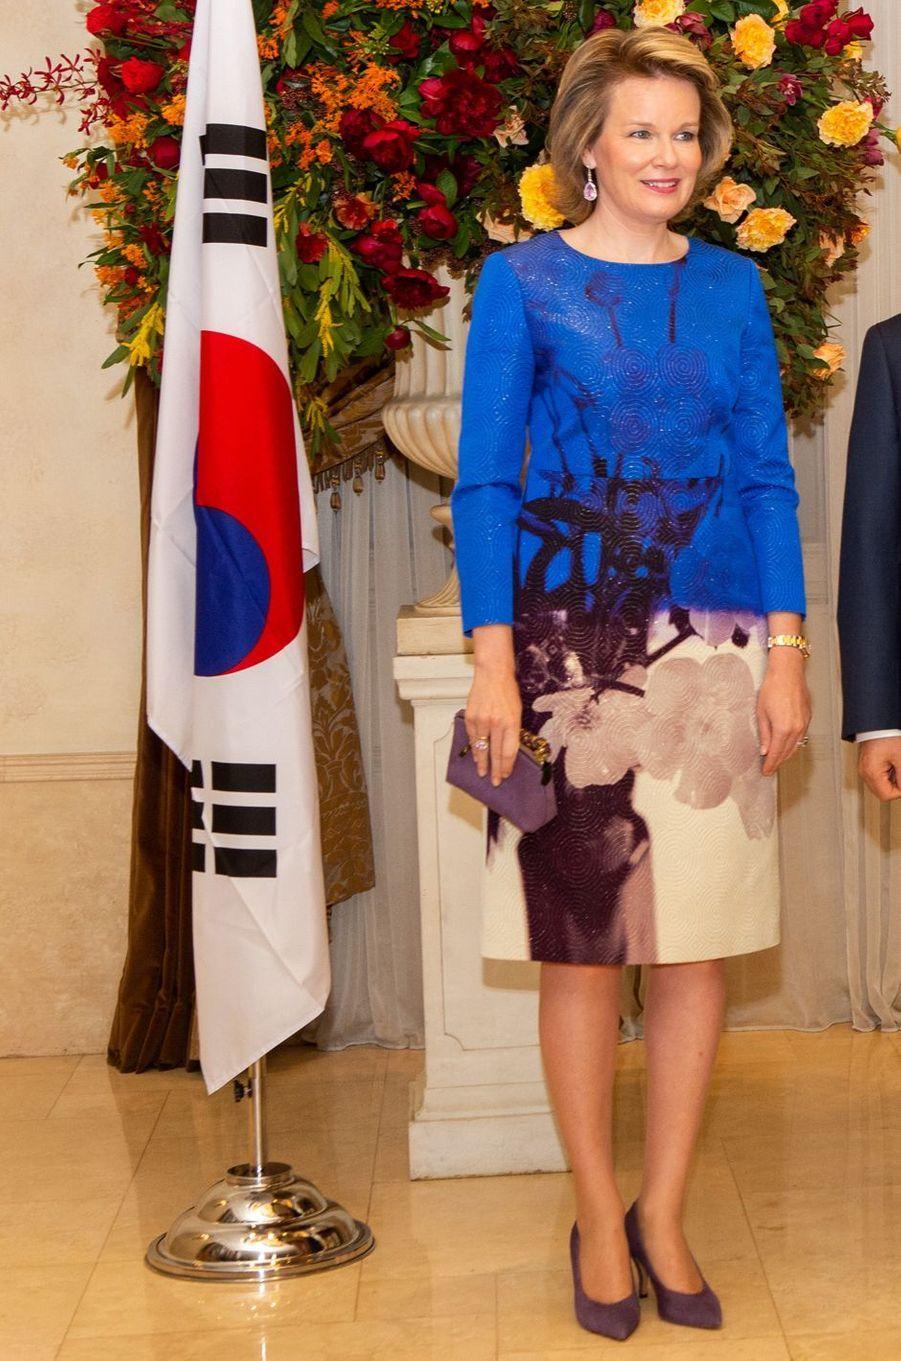 La reine des Belges Mathilde en Dries Van Noten en Corée du Sud, le 27 mars 2019